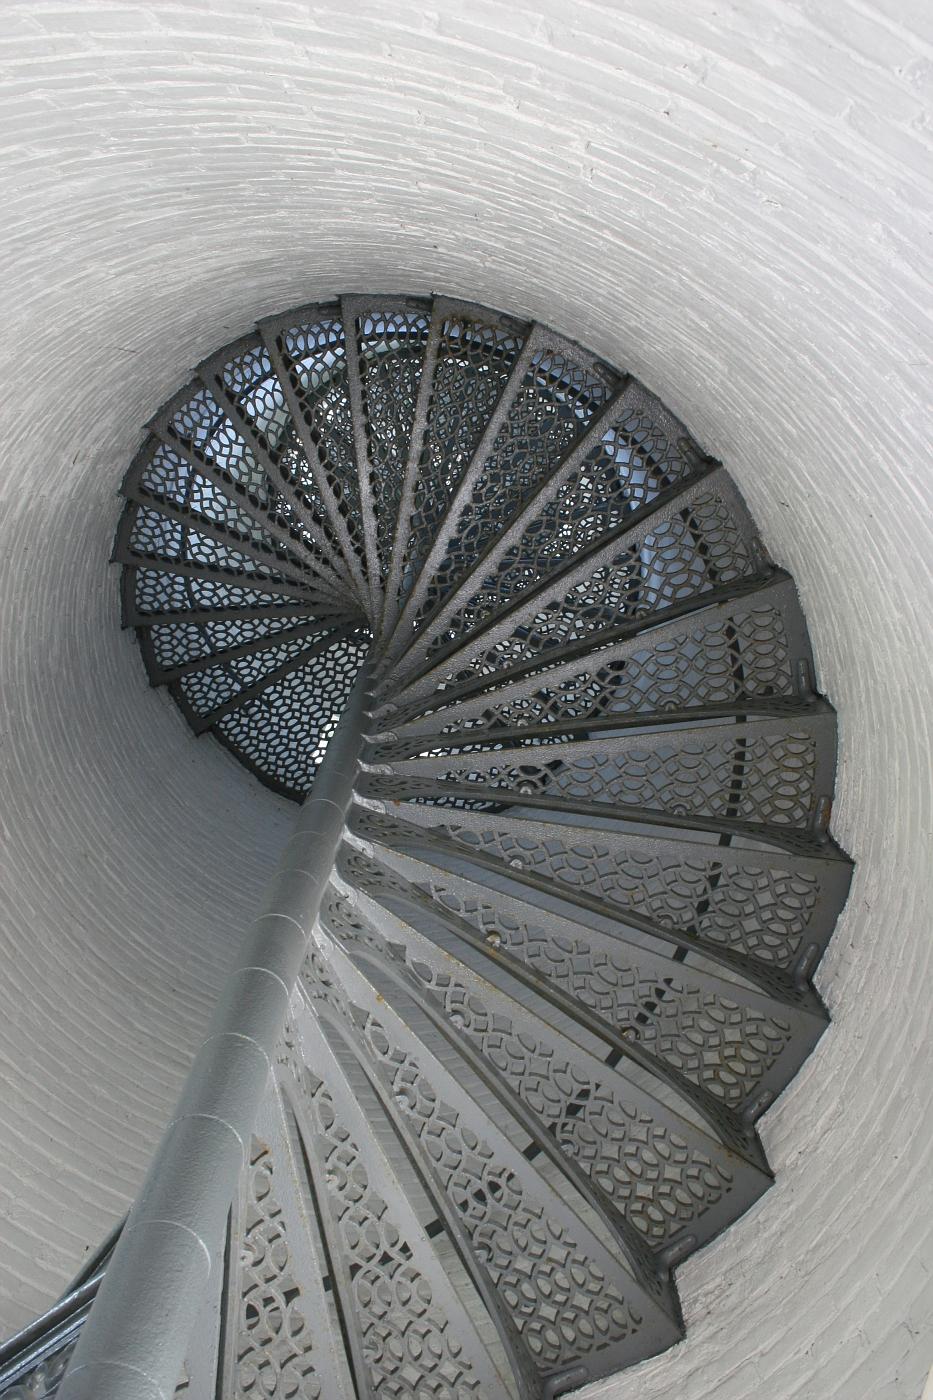 Lighthouse Interior #11